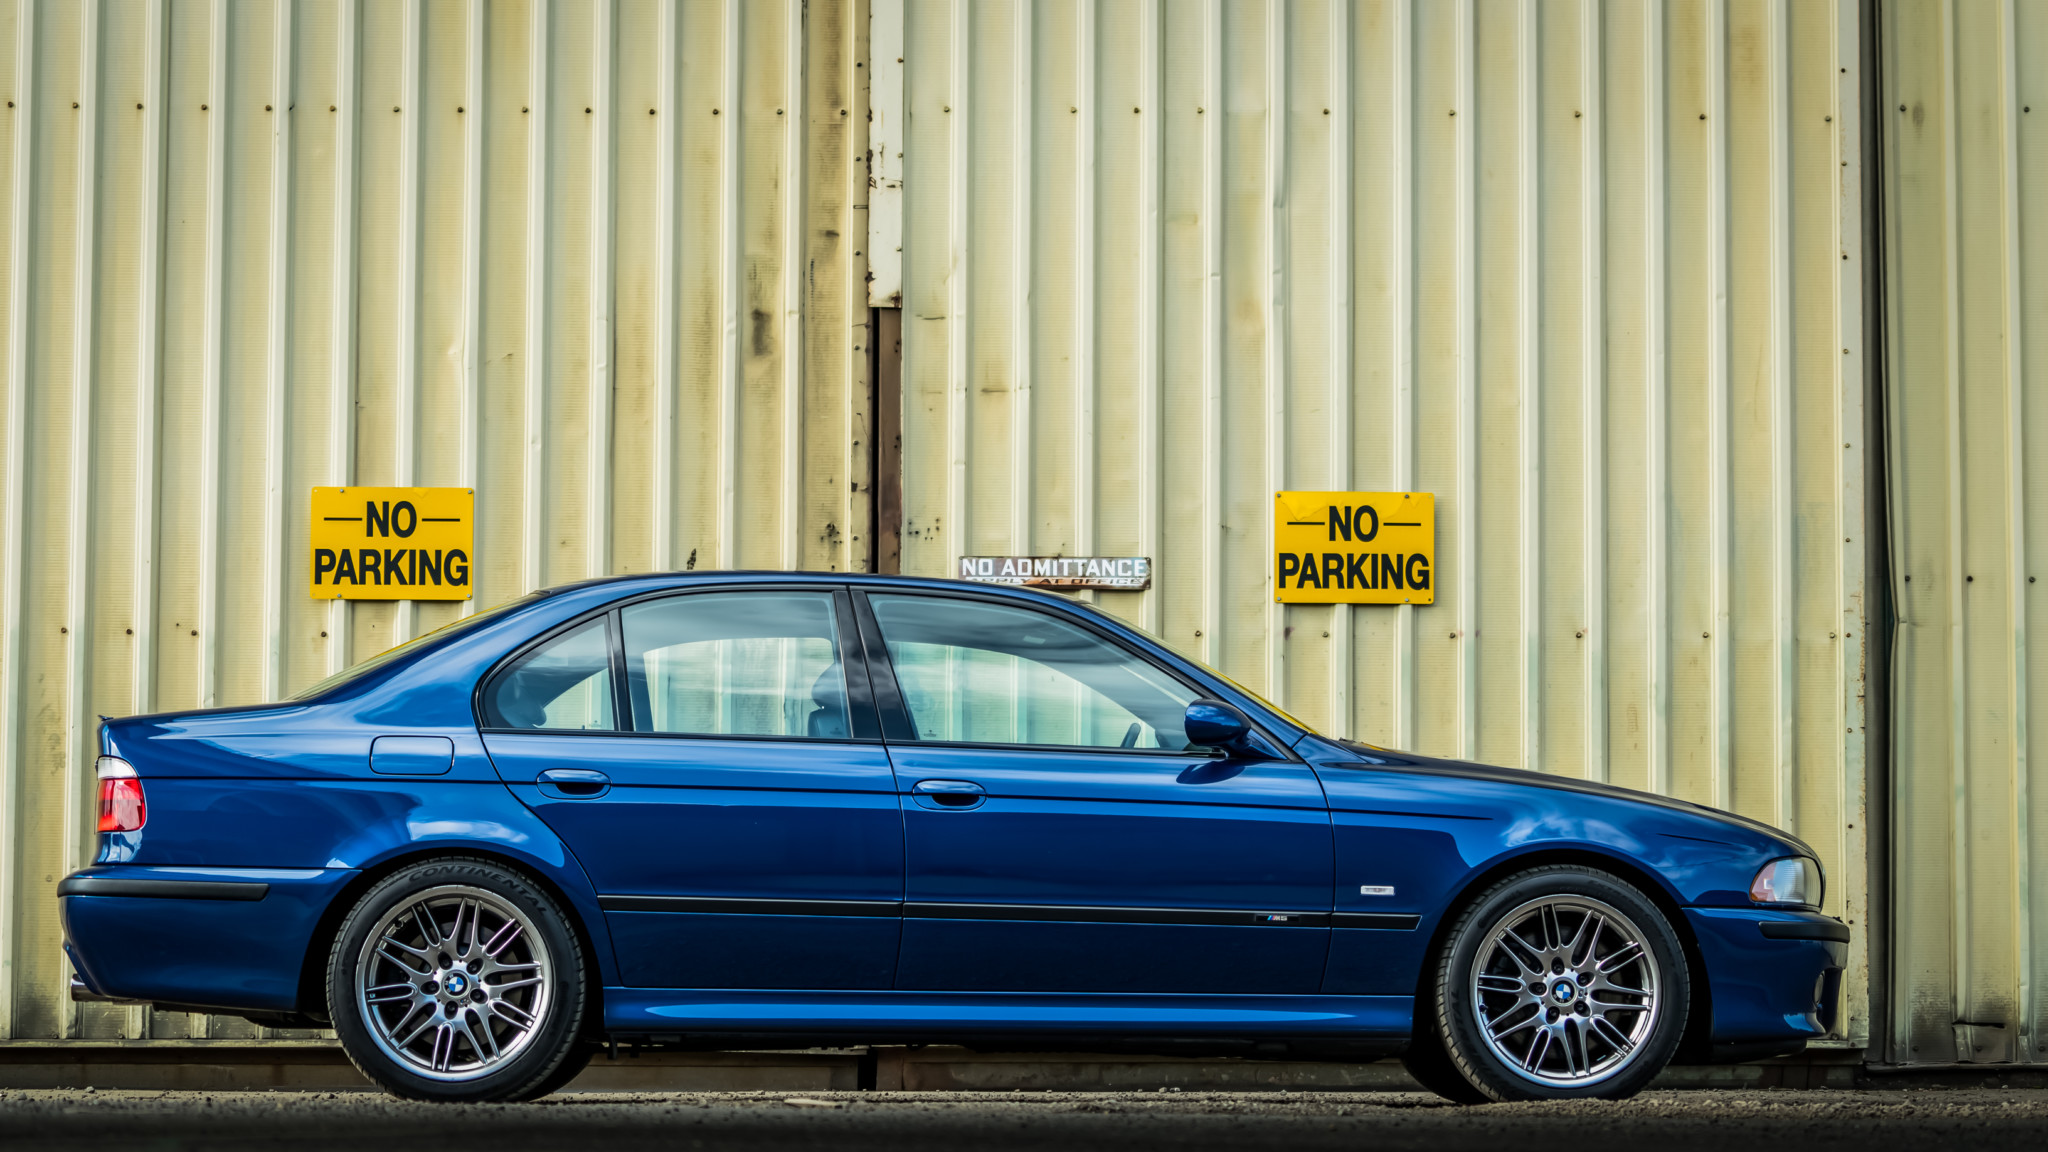 Car Bmw Bmw M5 Blue Blue Cars Side View Vehicle E39 Bmw 5 Series Bmw E39 Wallpaper Resolution 2048x1152 Id 634585 Wallha Com